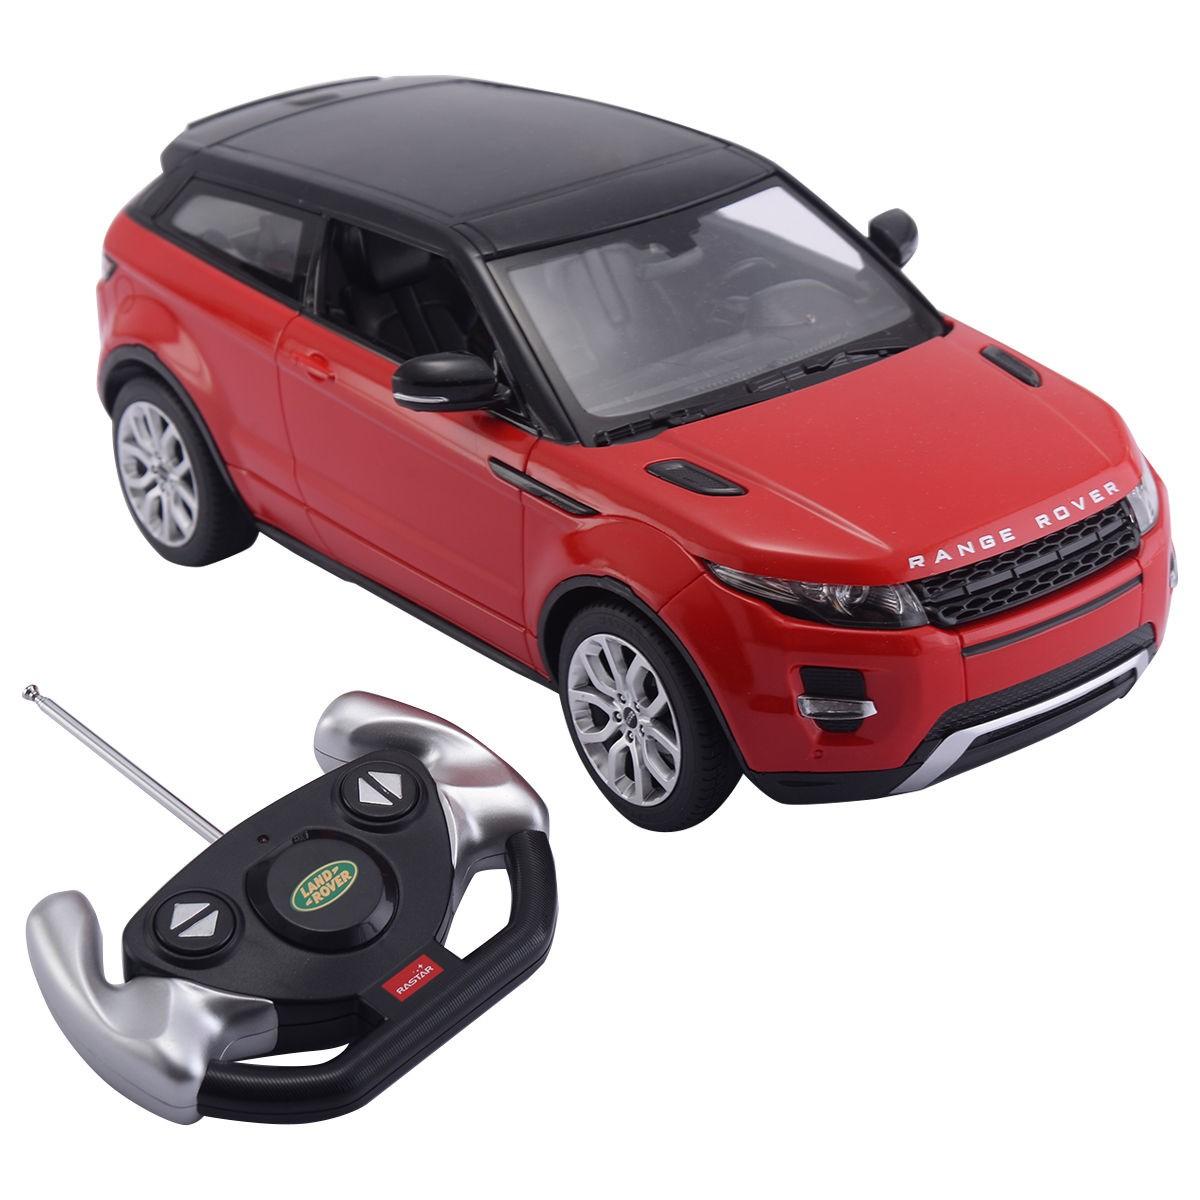 1 14 range rover evoque licensed electric radio remote control rc car ebay. Black Bedroom Furniture Sets. Home Design Ideas